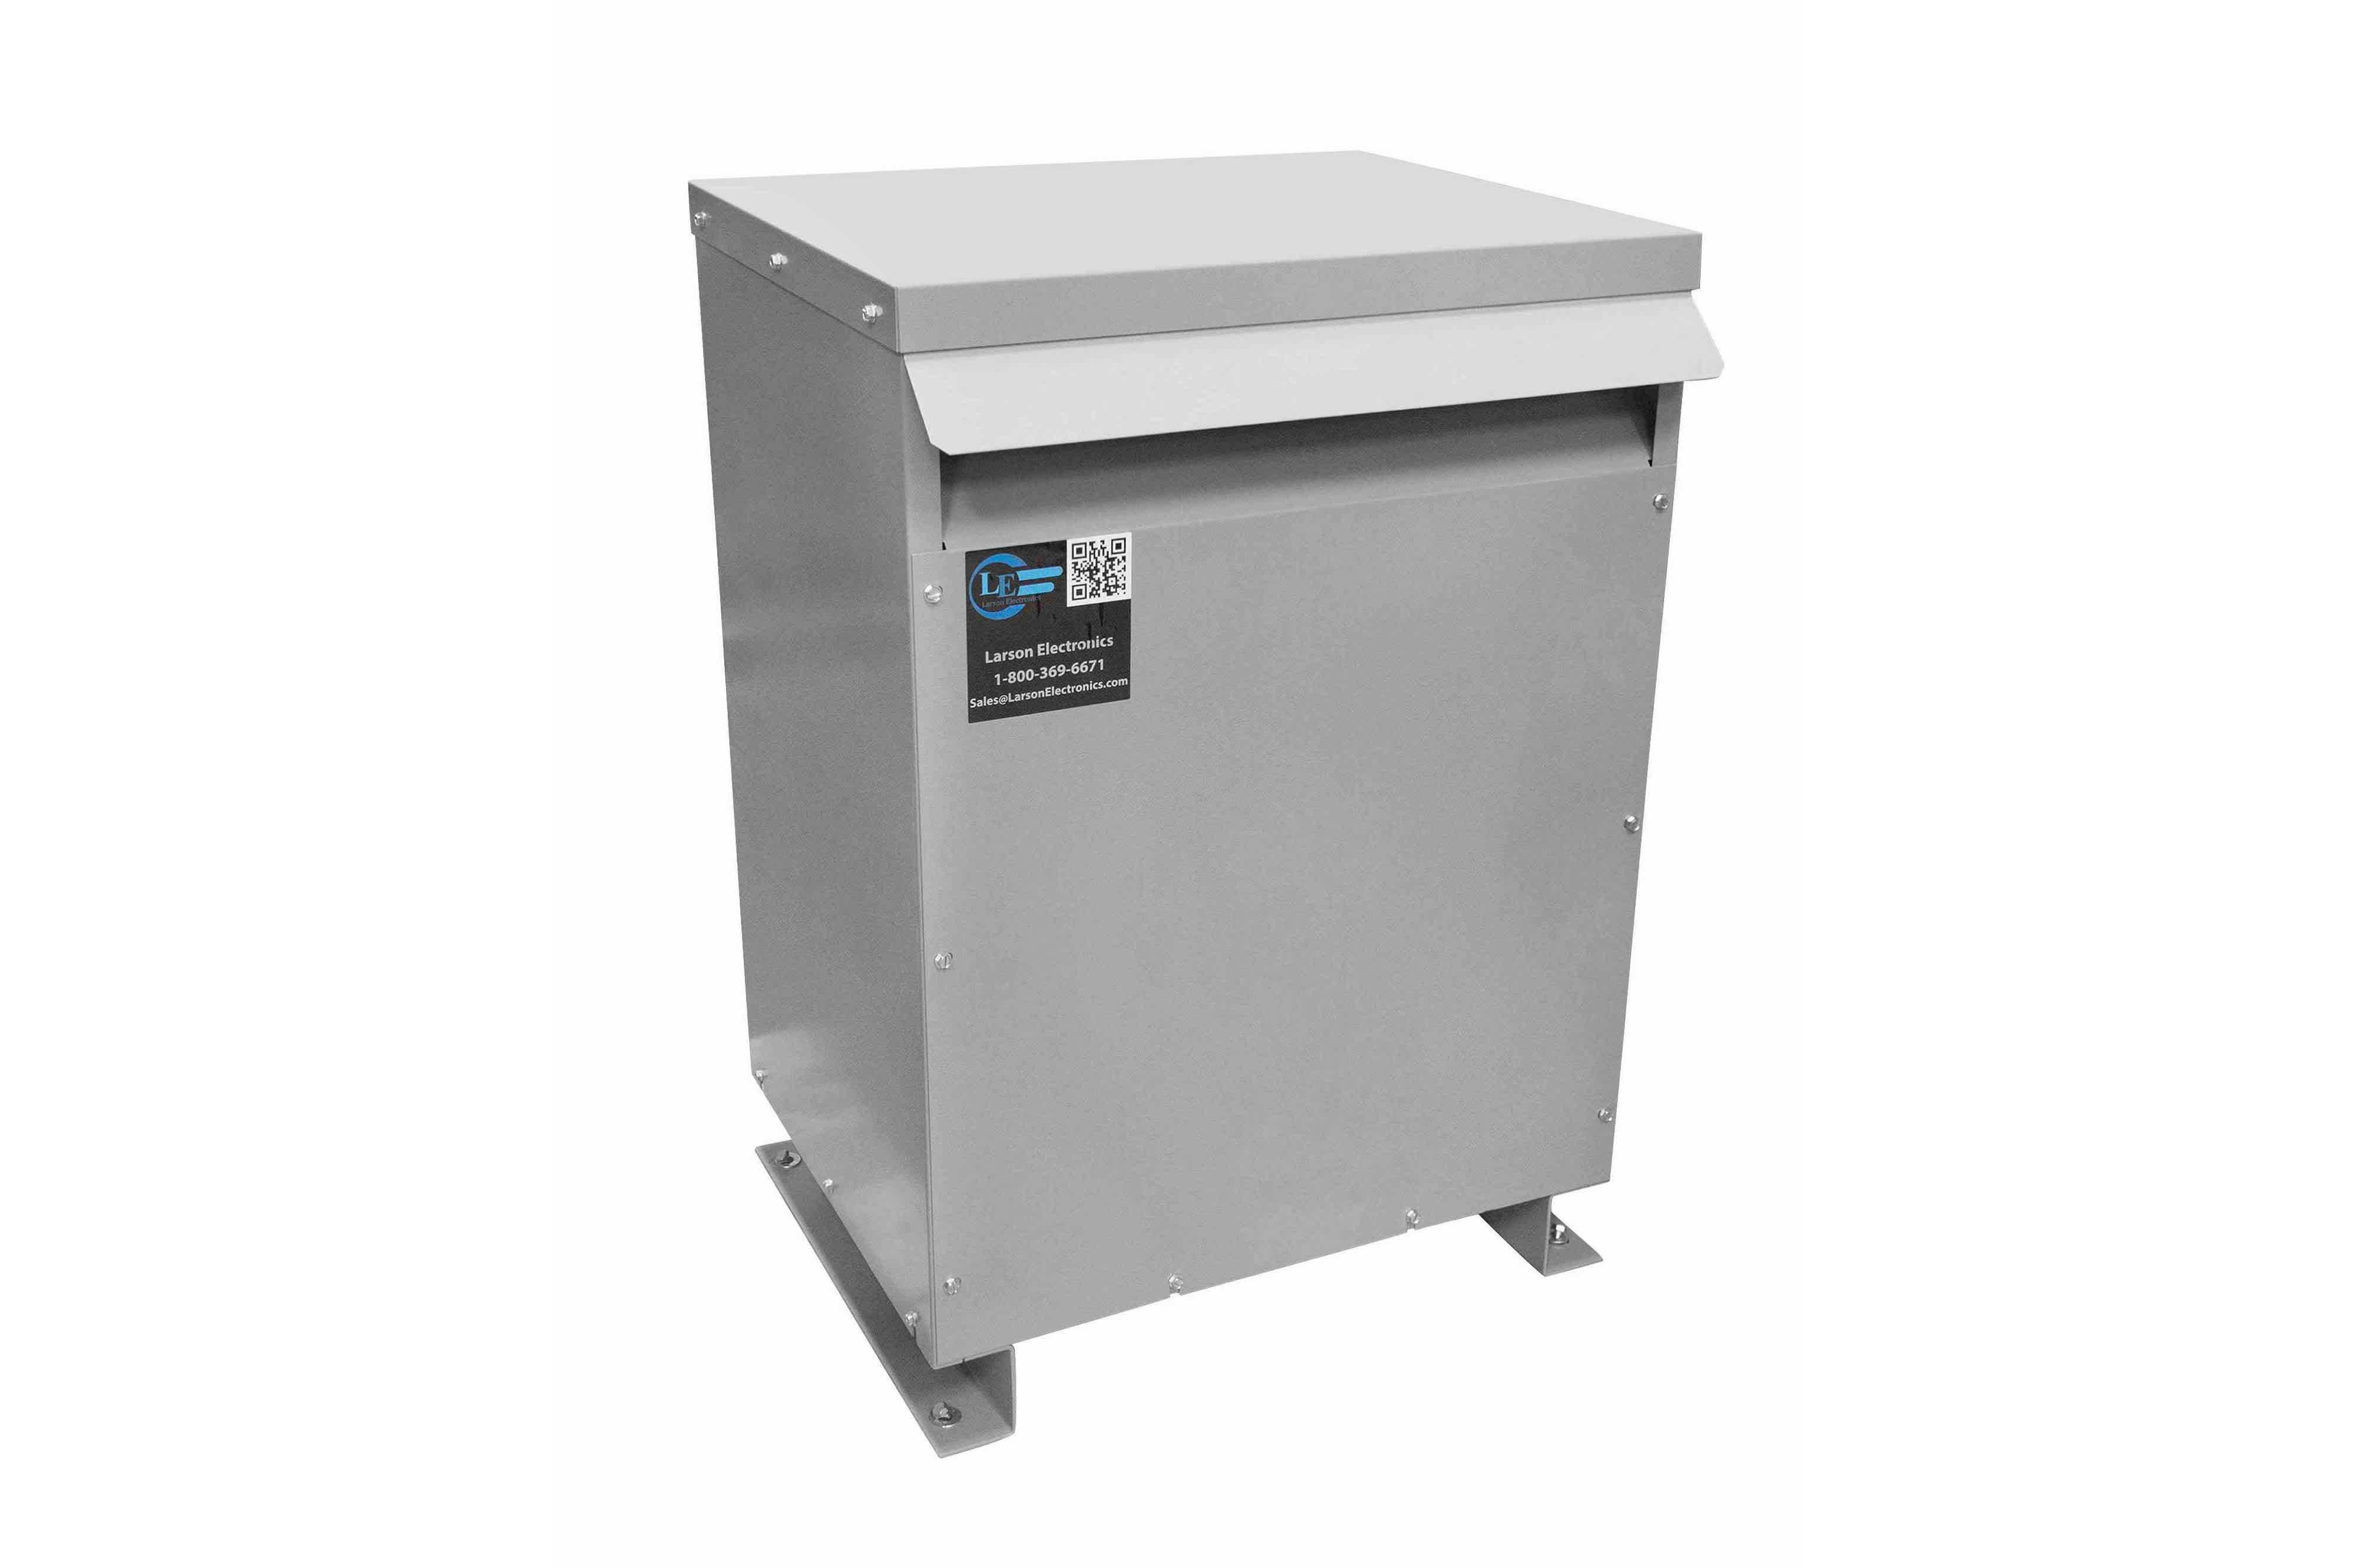 27 kVA 3PH Isolation Transformer, 208V Wye Primary, 400V Delta Secondary, N3R, Ventilated, 60 Hz